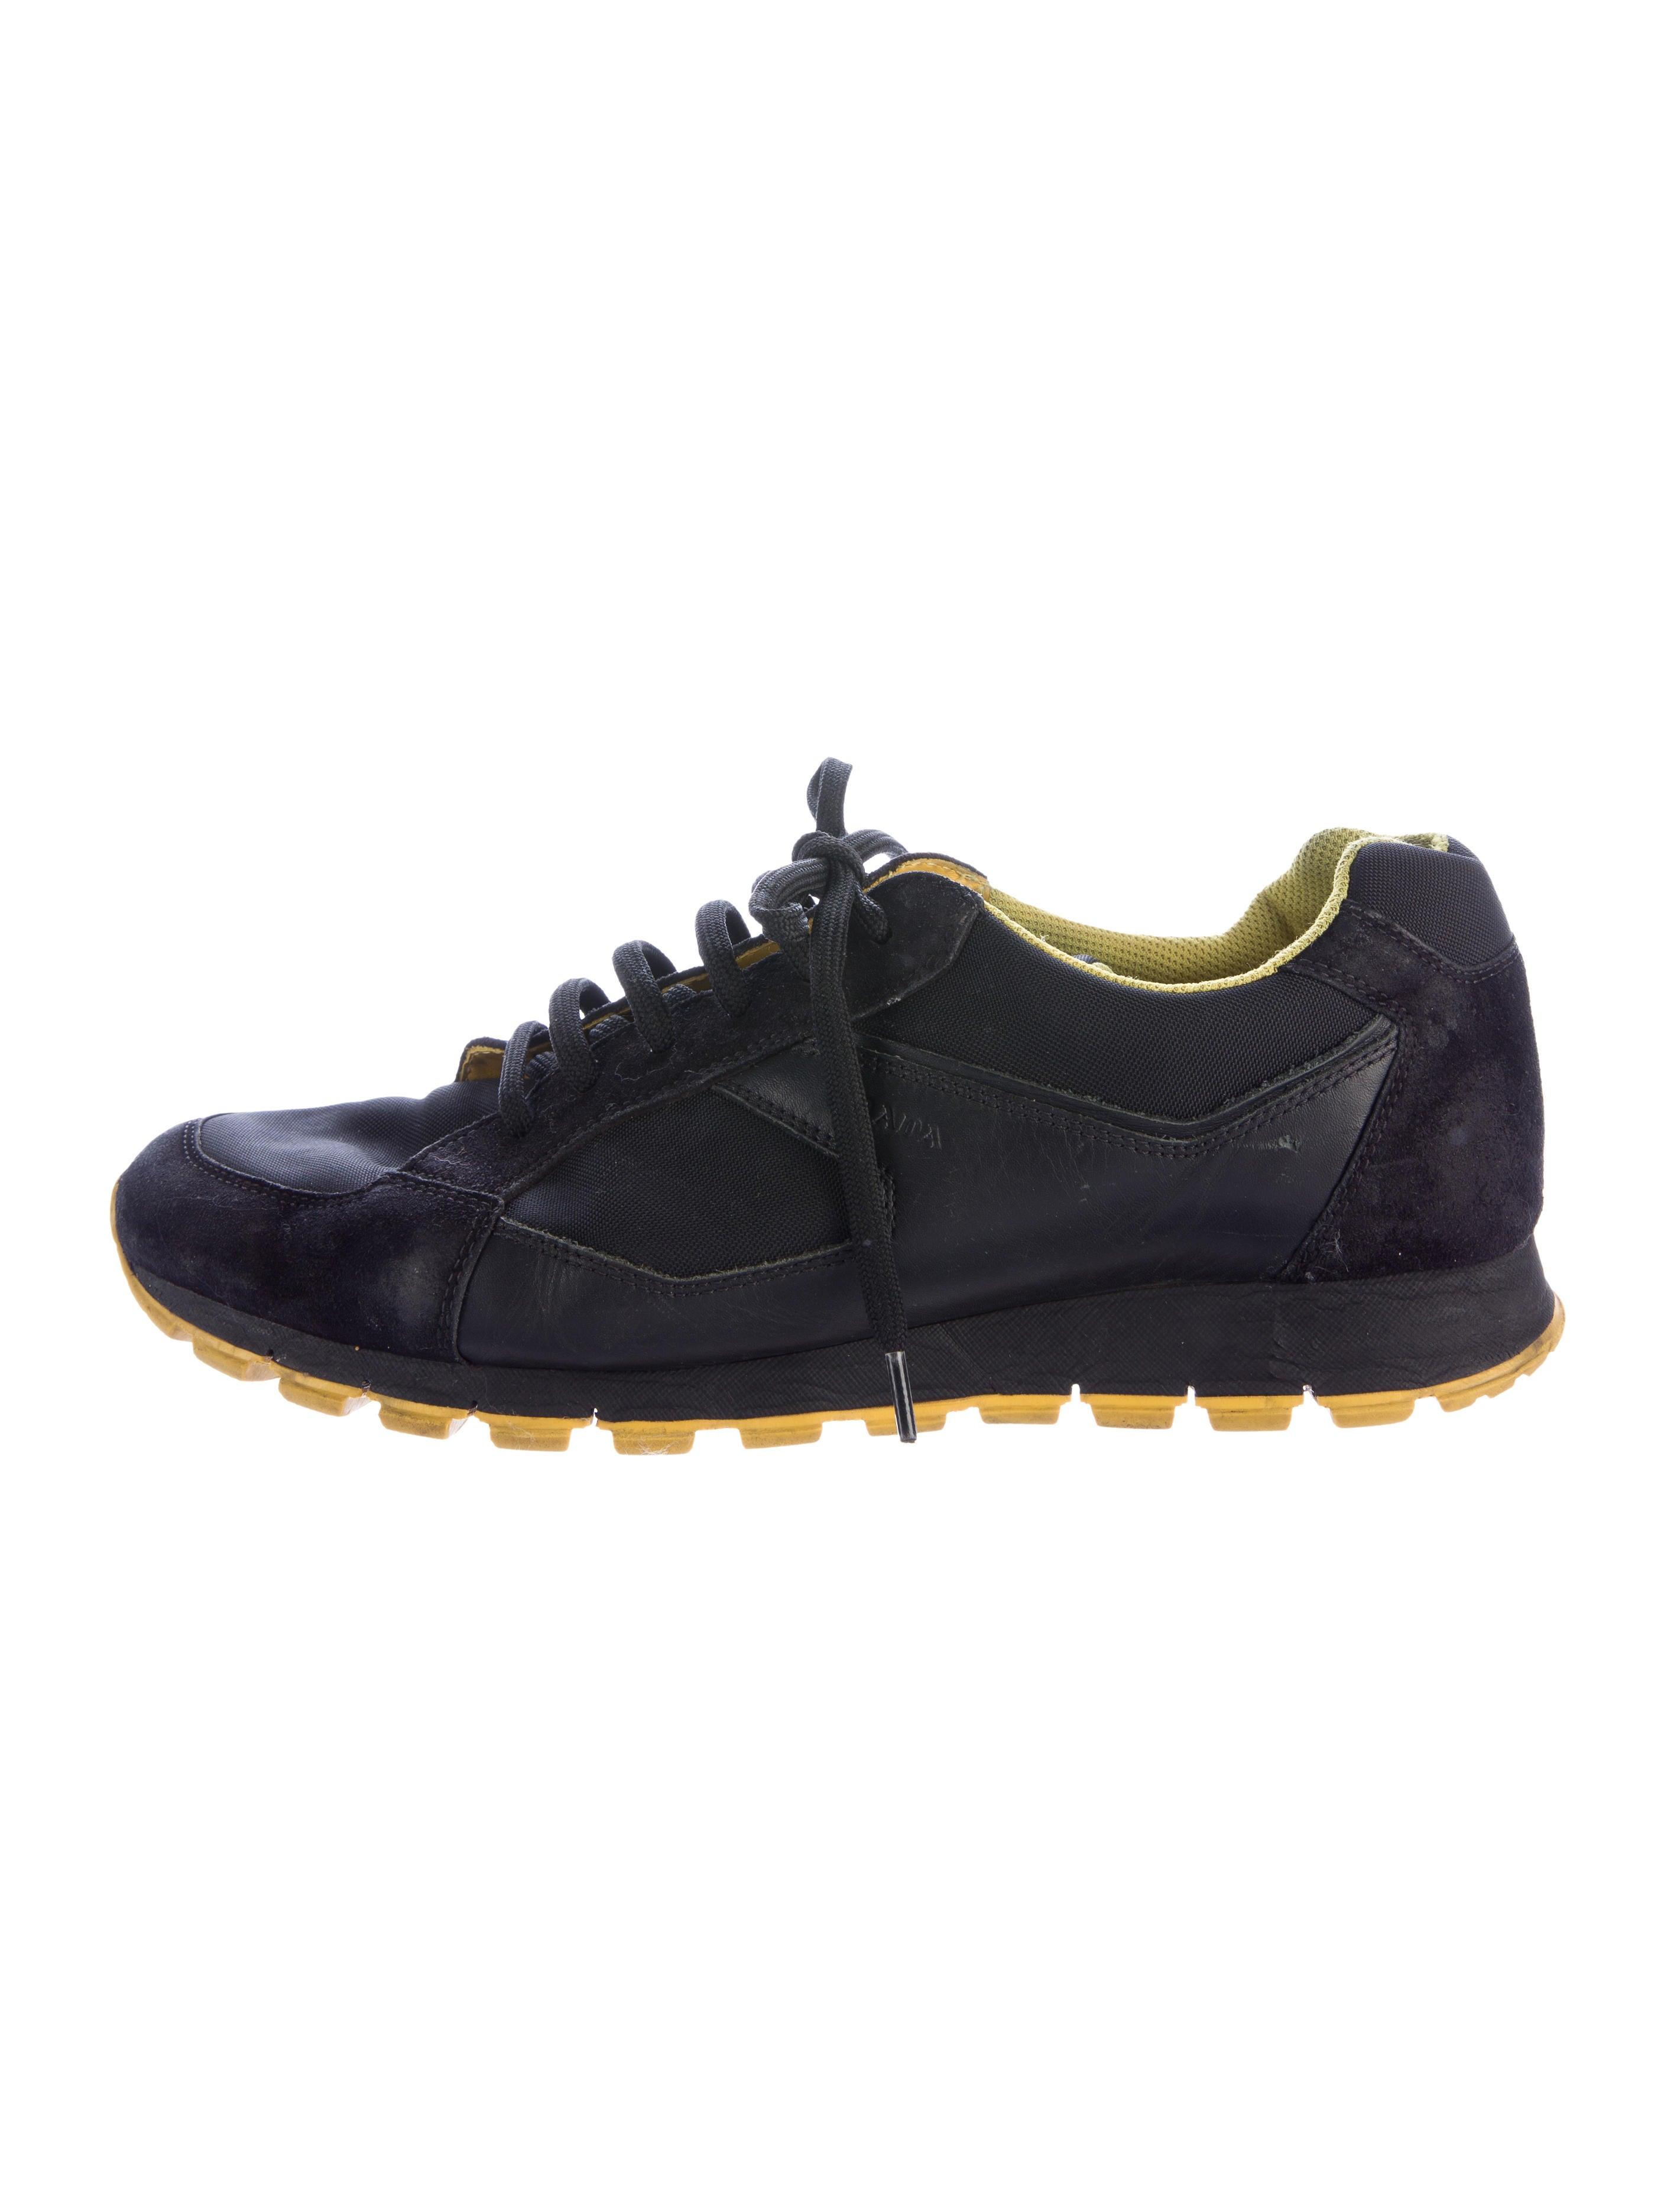 prada sport leather low top sneakers shoes wpr40539